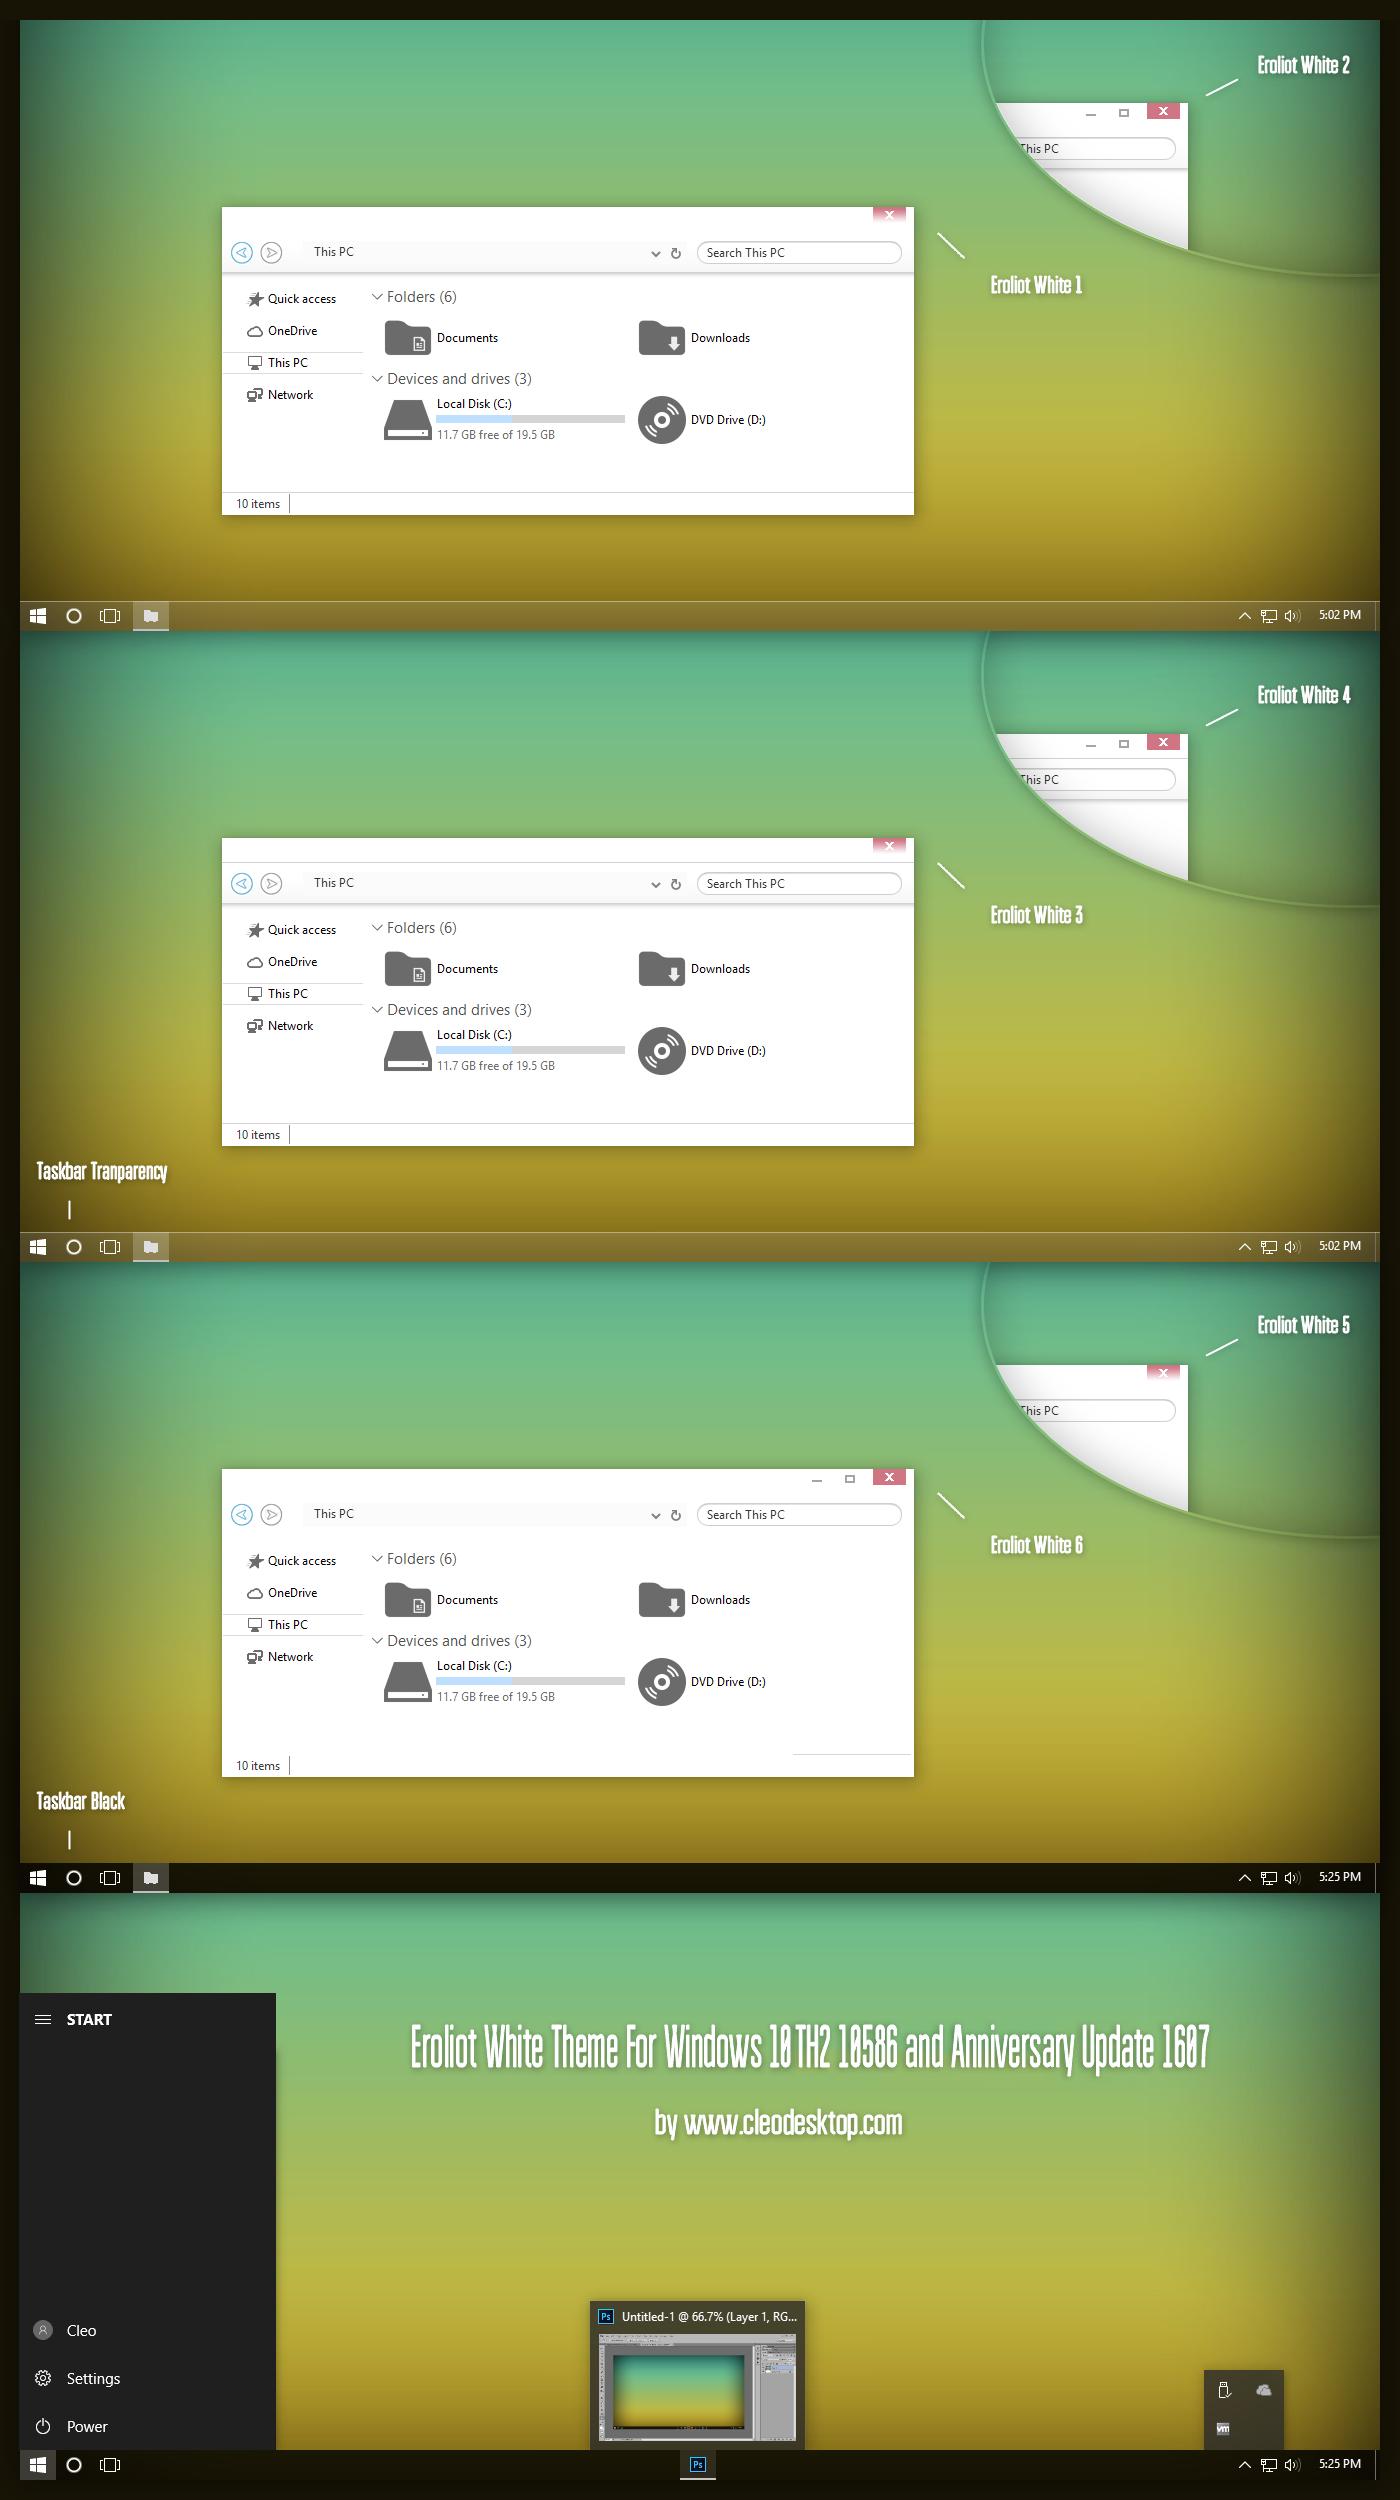 Eroliot White Theme For Win10 Anniversary Update by Cleodesktop